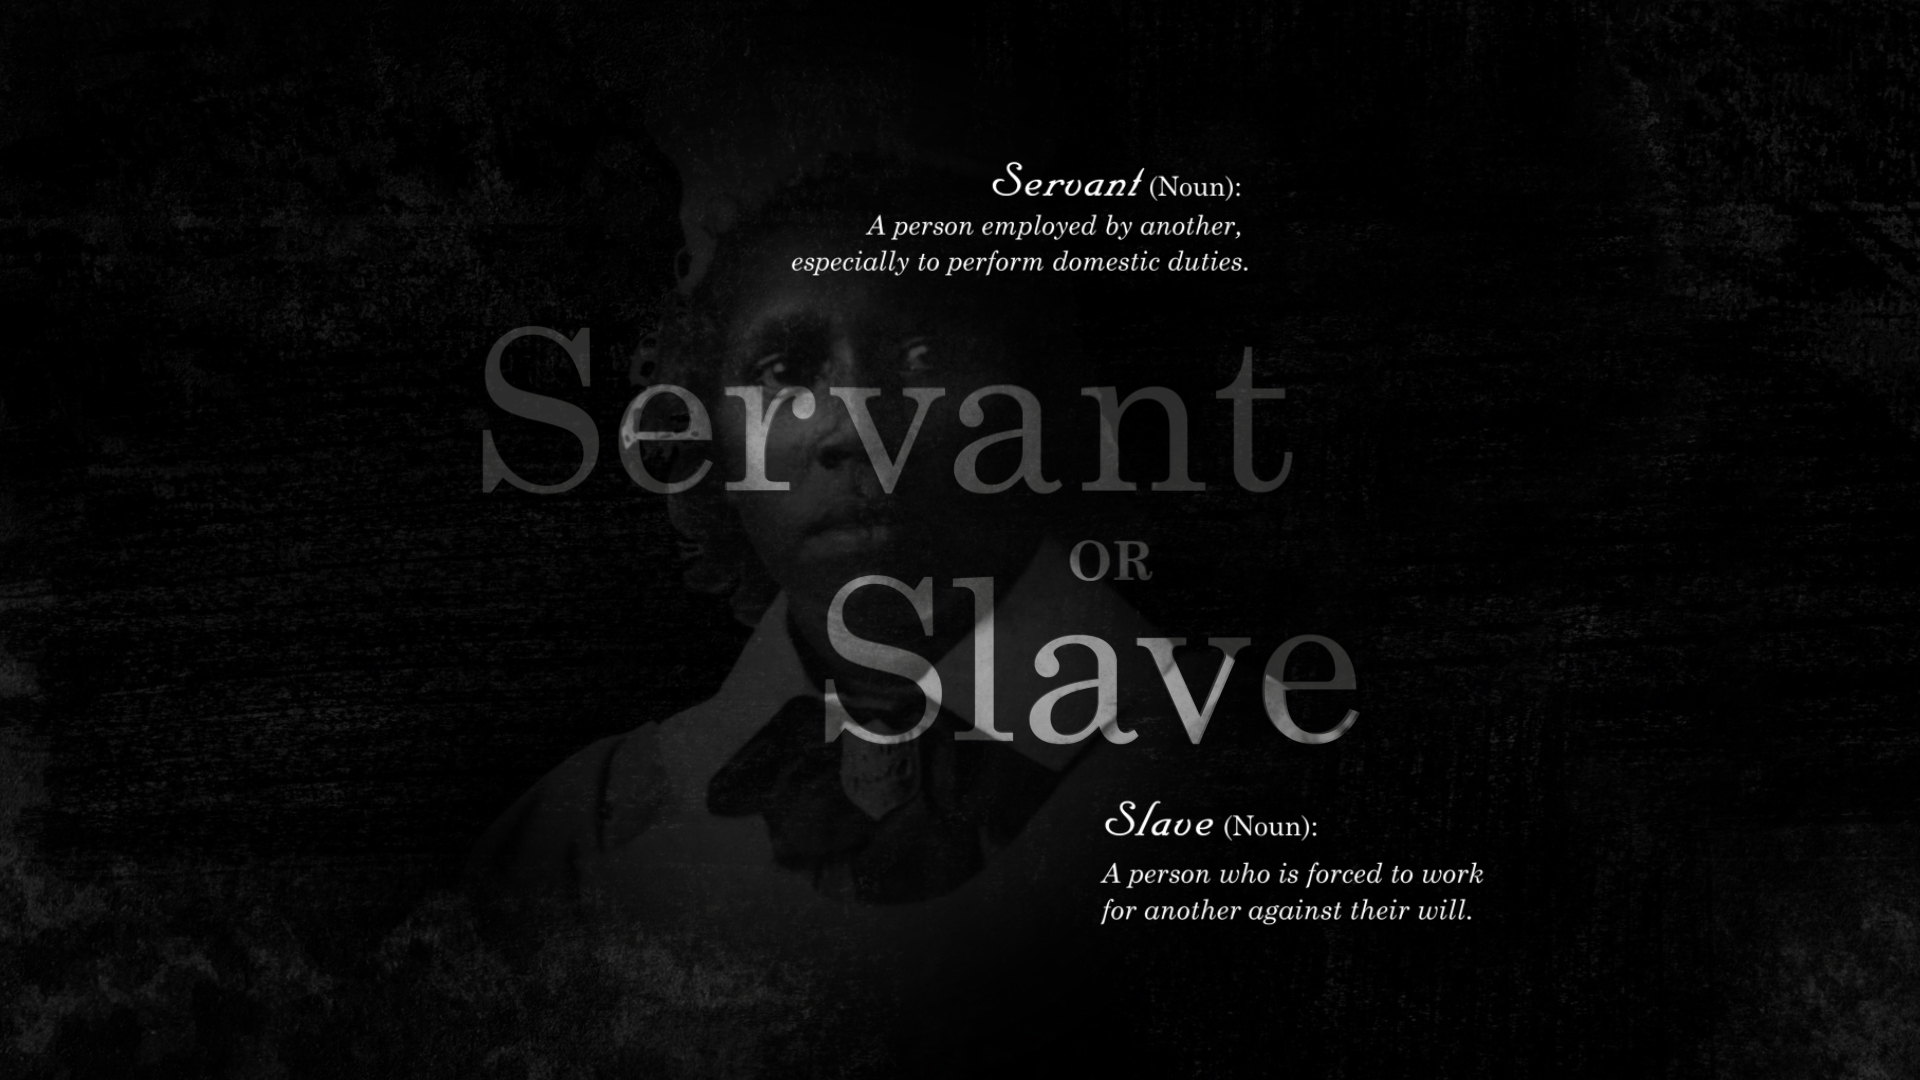 Servant or Slave_Titles 4.jpg